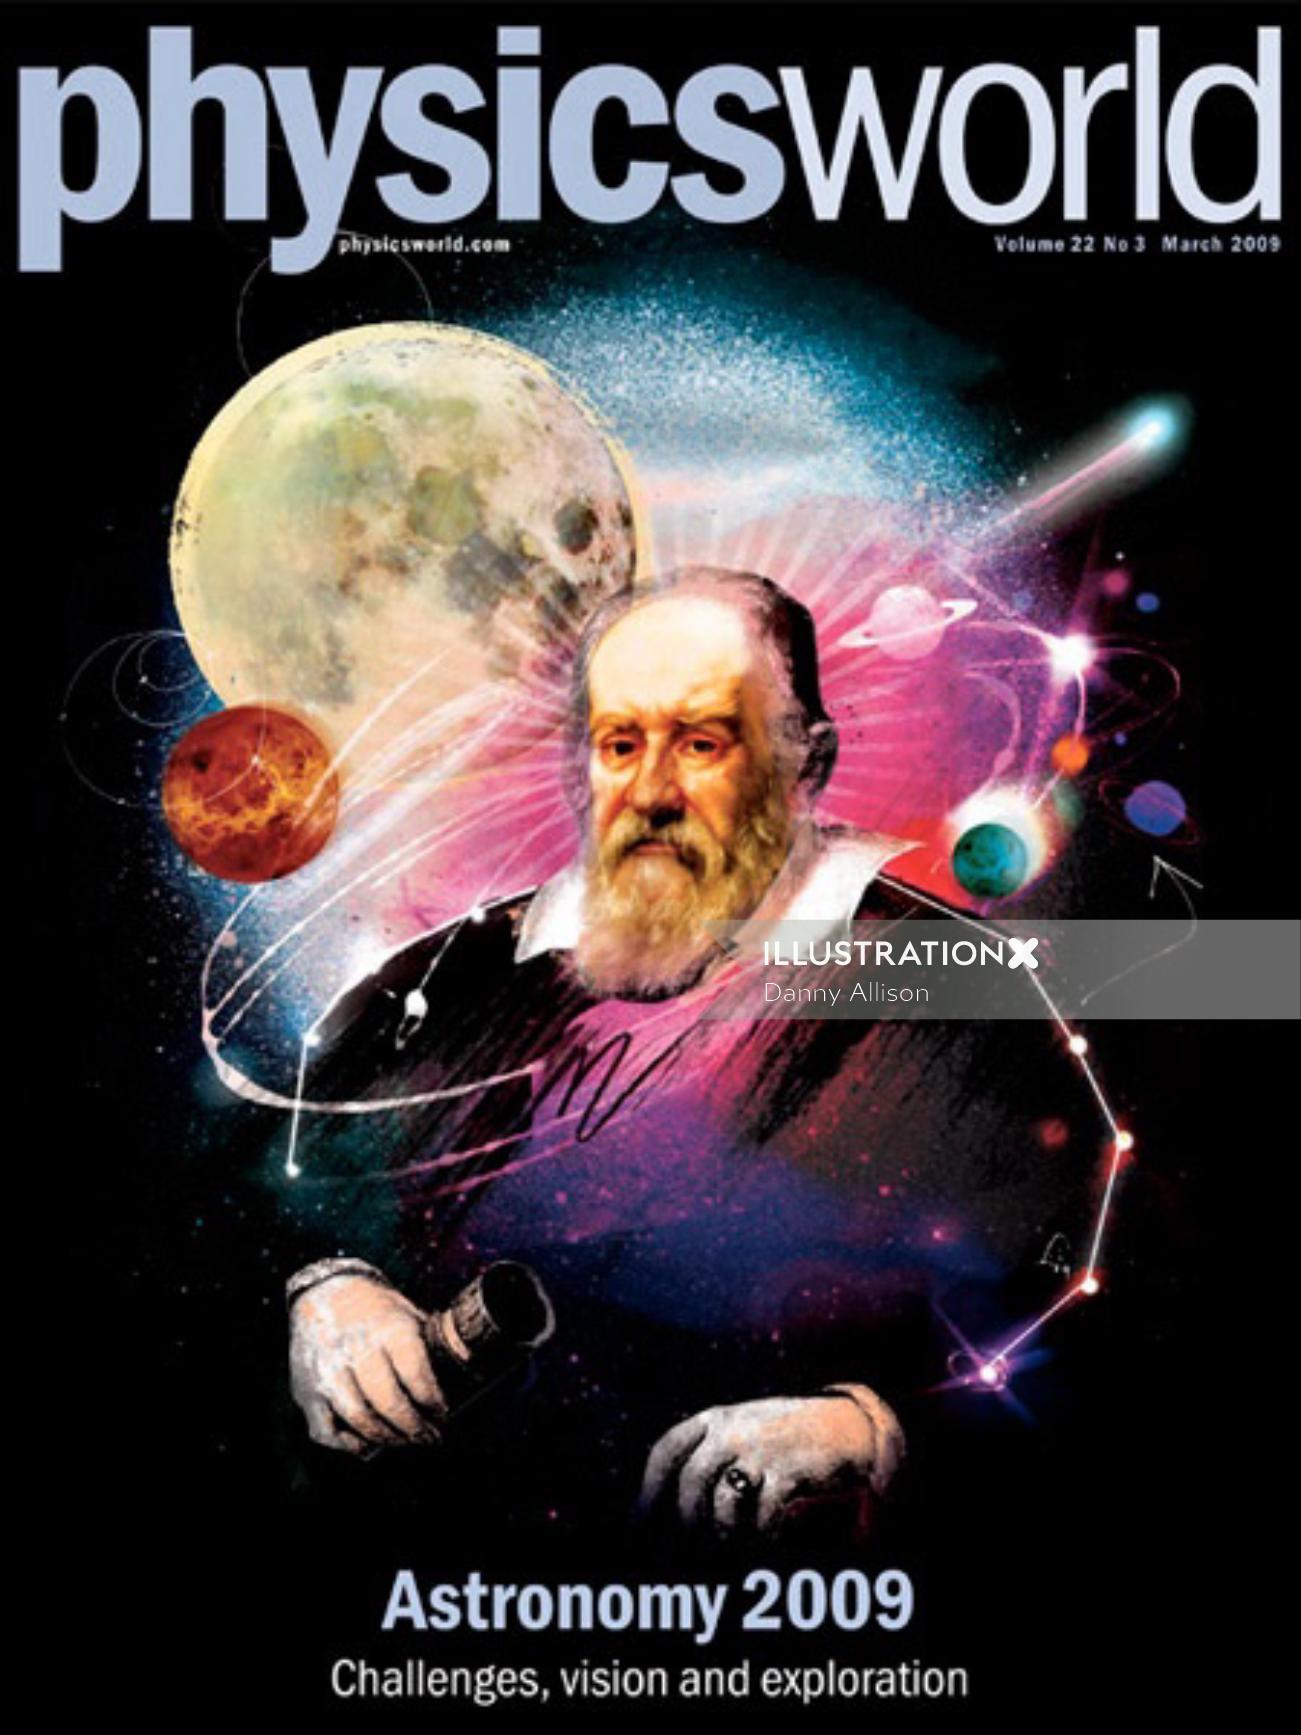 moon, planets, galileo, space, stars, portrait, astronomy, astronomer, galaxy,